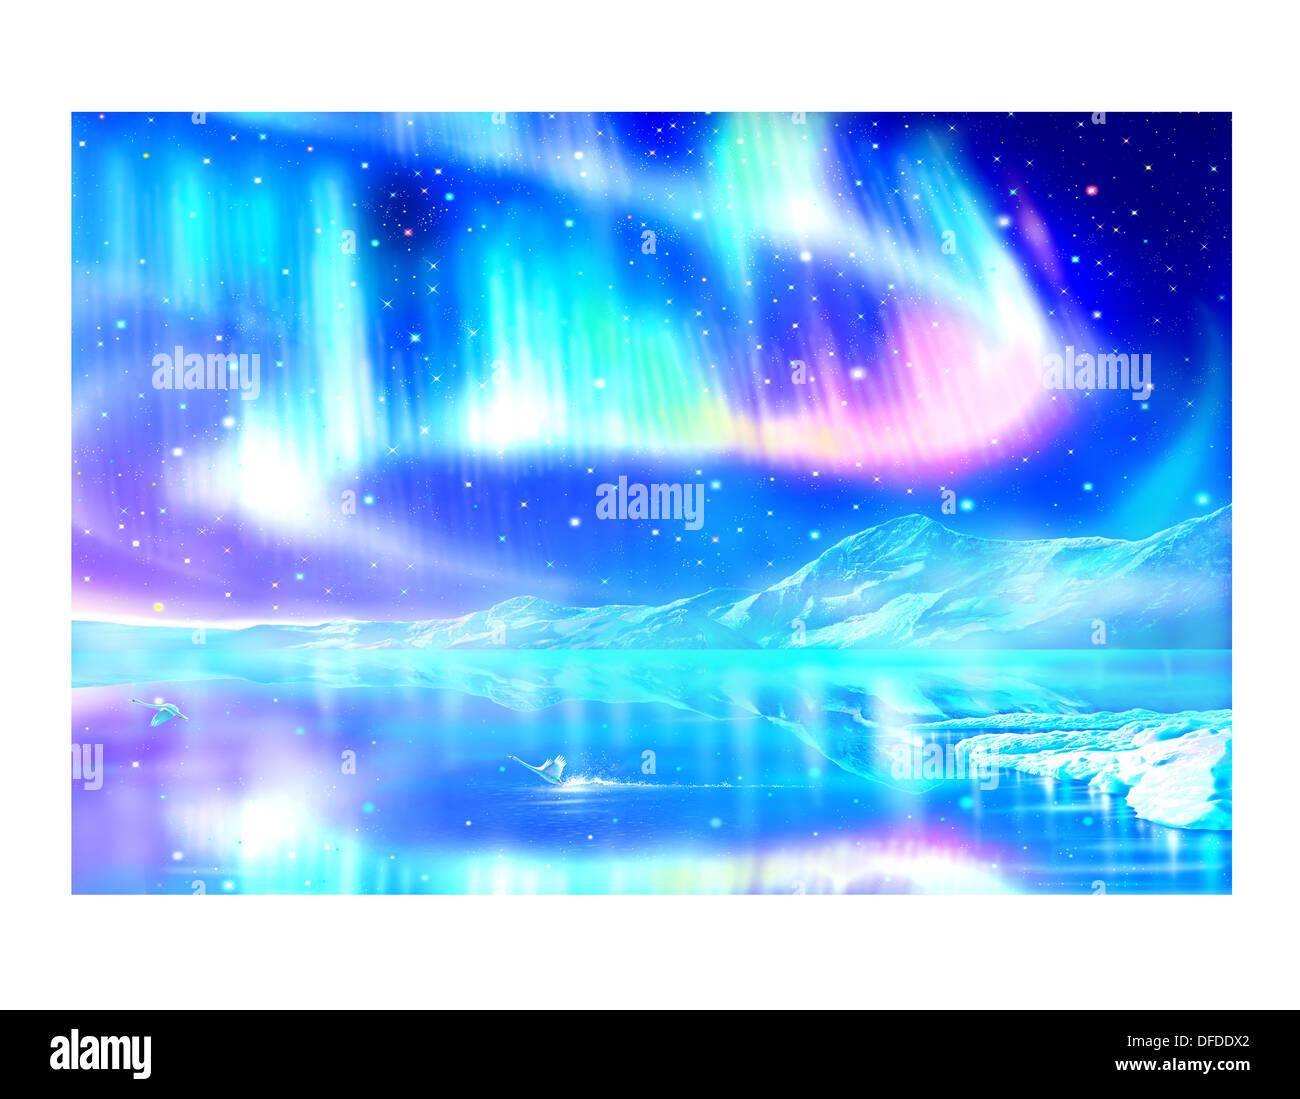 CG Illustration - Stock Image